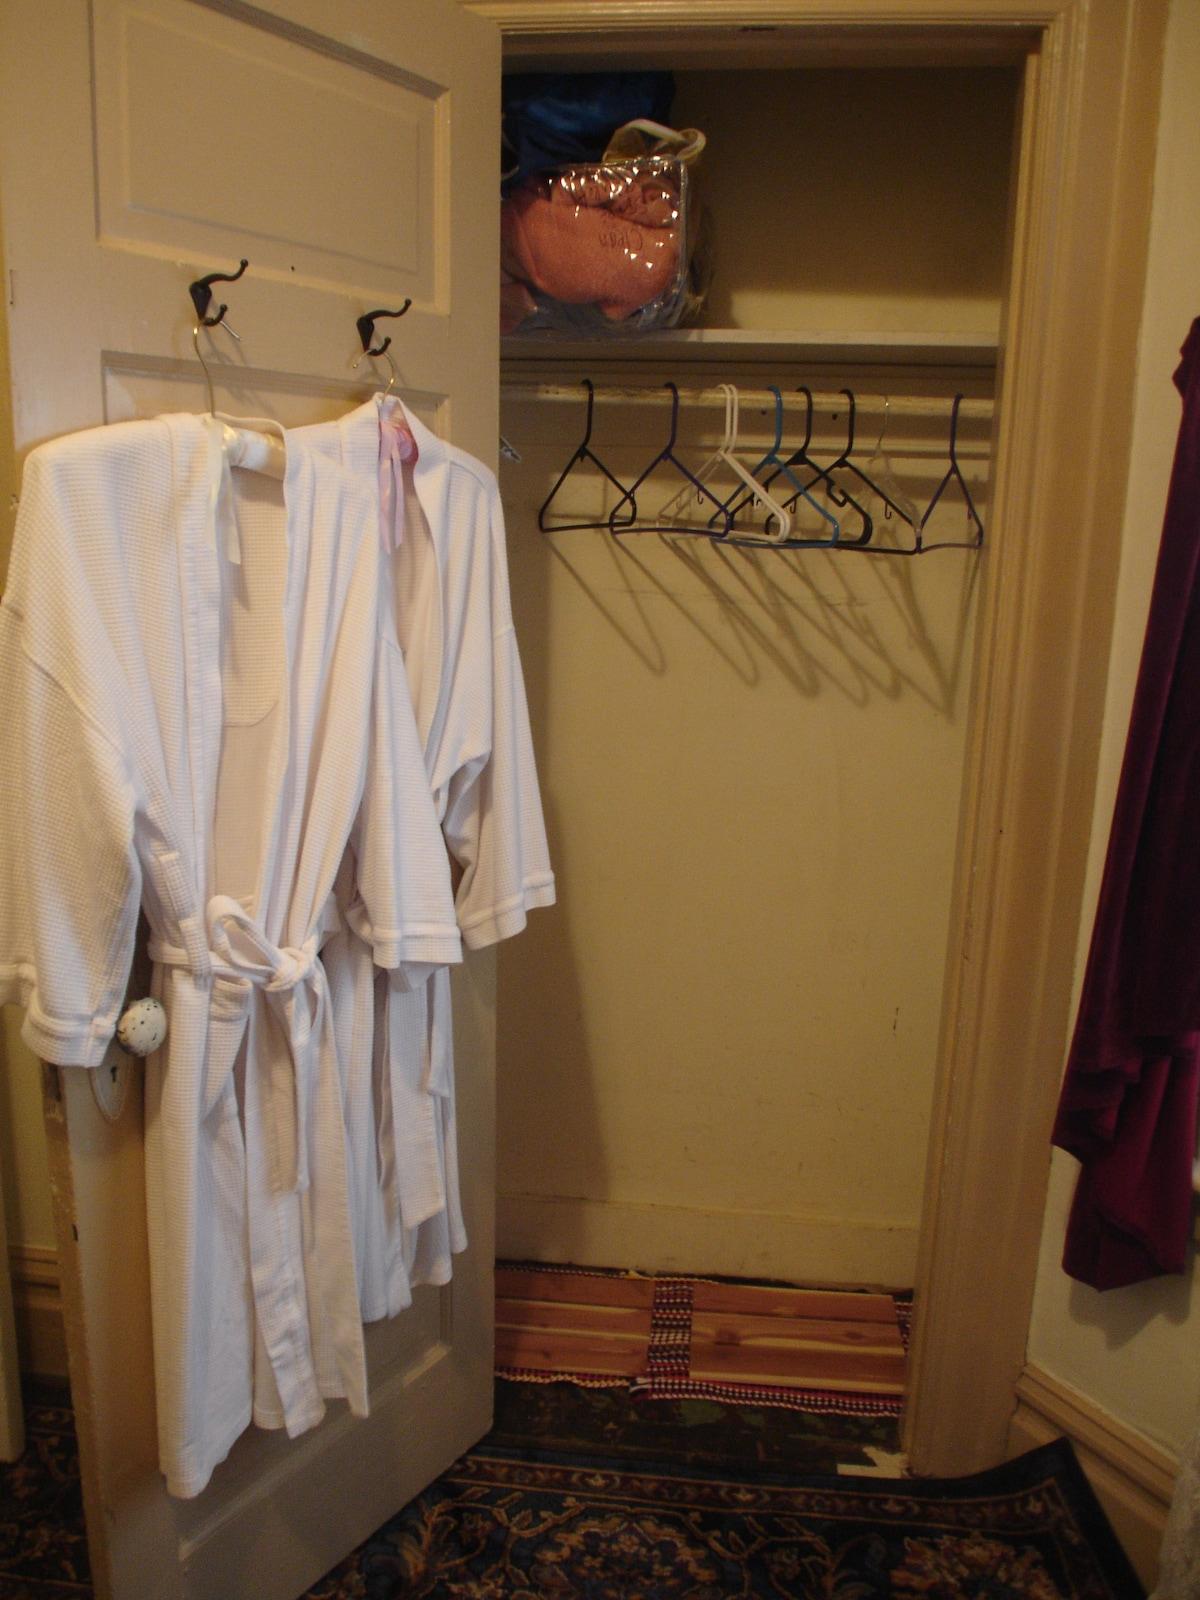 Full closet to use.